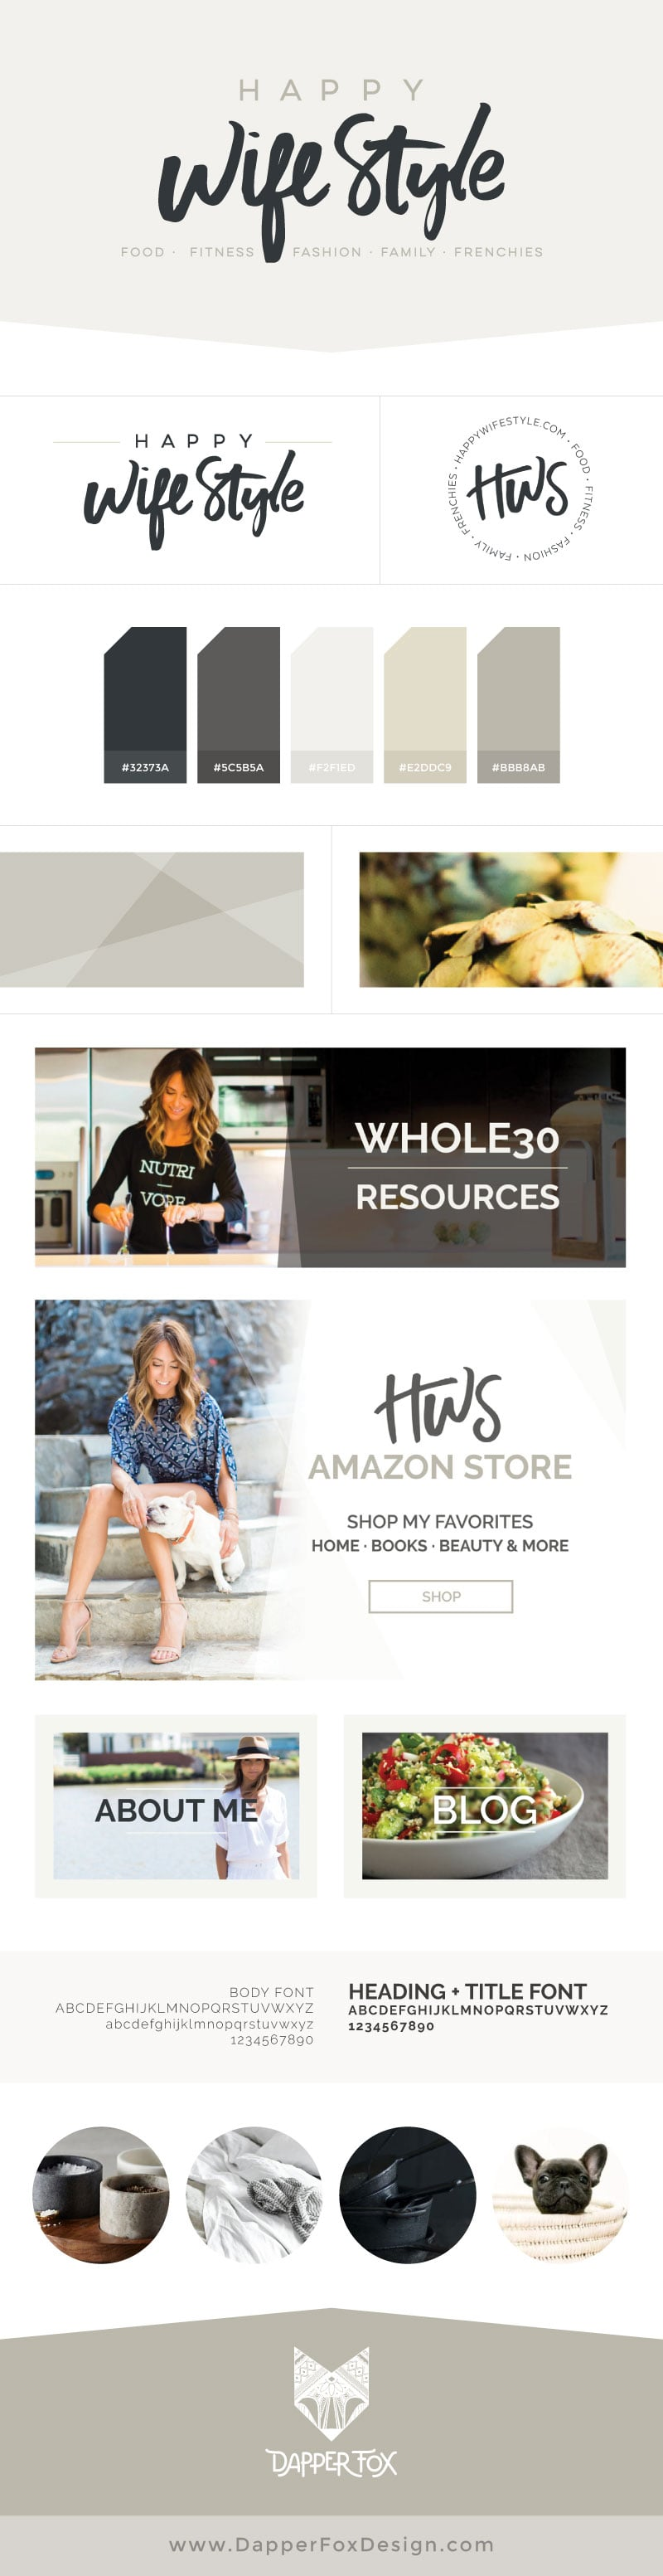 Happy WifeStyle Brand and Logo Design by Dapper Fox - Branding and Website Design for Entrepreneurs. Modern Logo Design